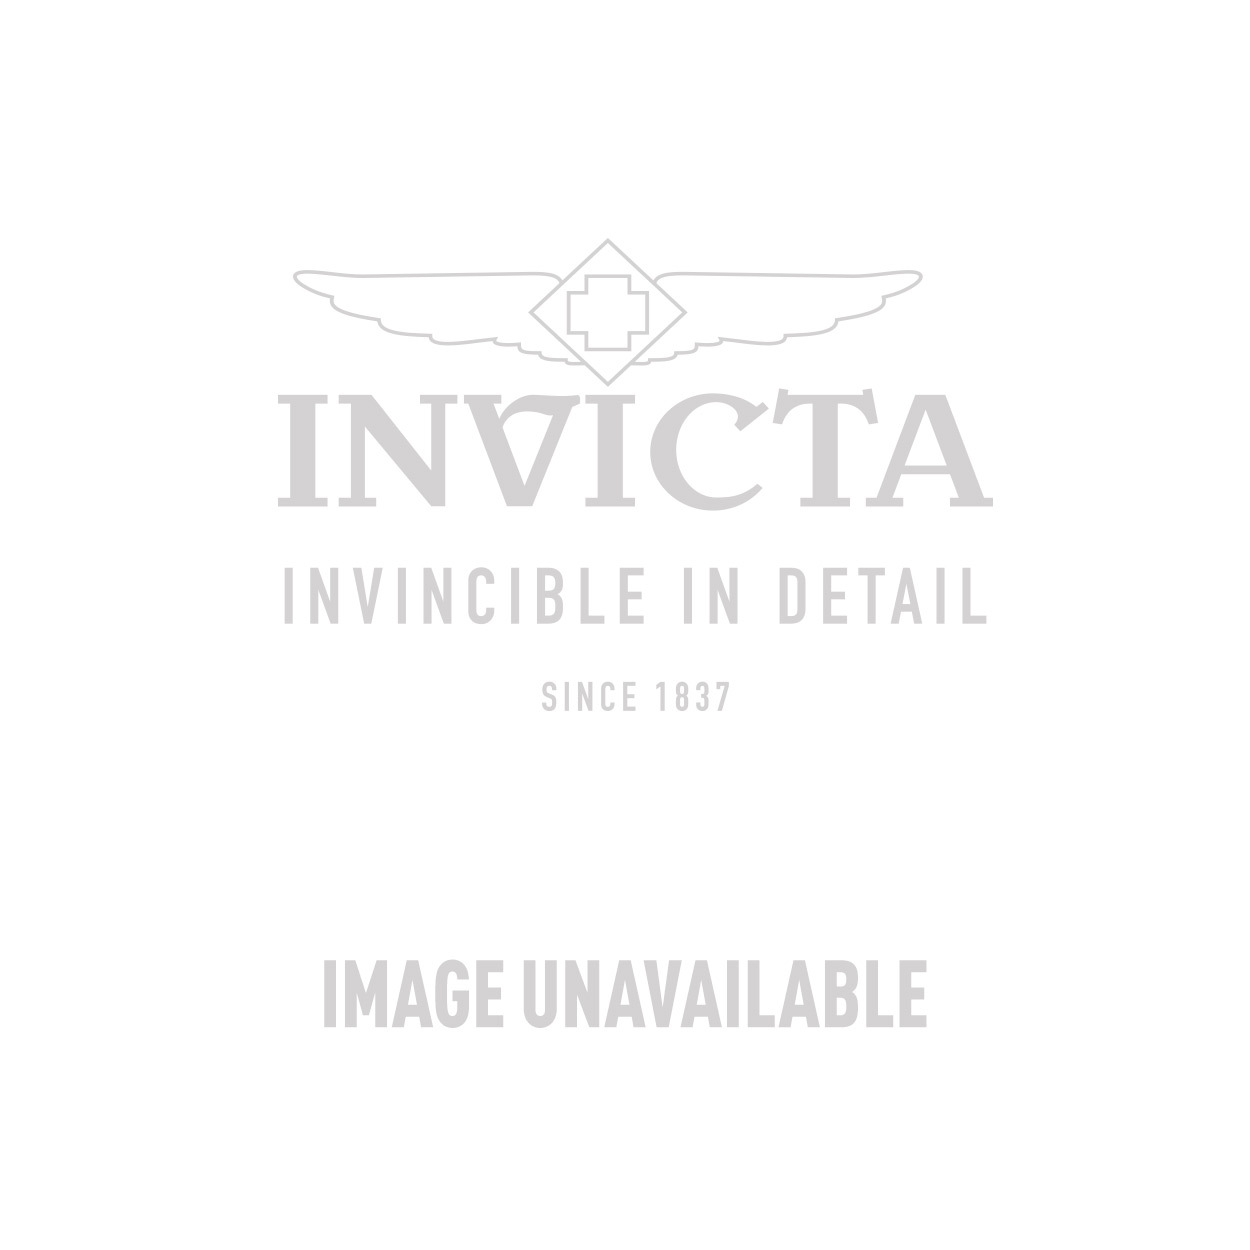 Invicta Corduba Swiss Movement Quartz Watch - Rose Gold case with Brown tone Polyurethane band - Model 10506